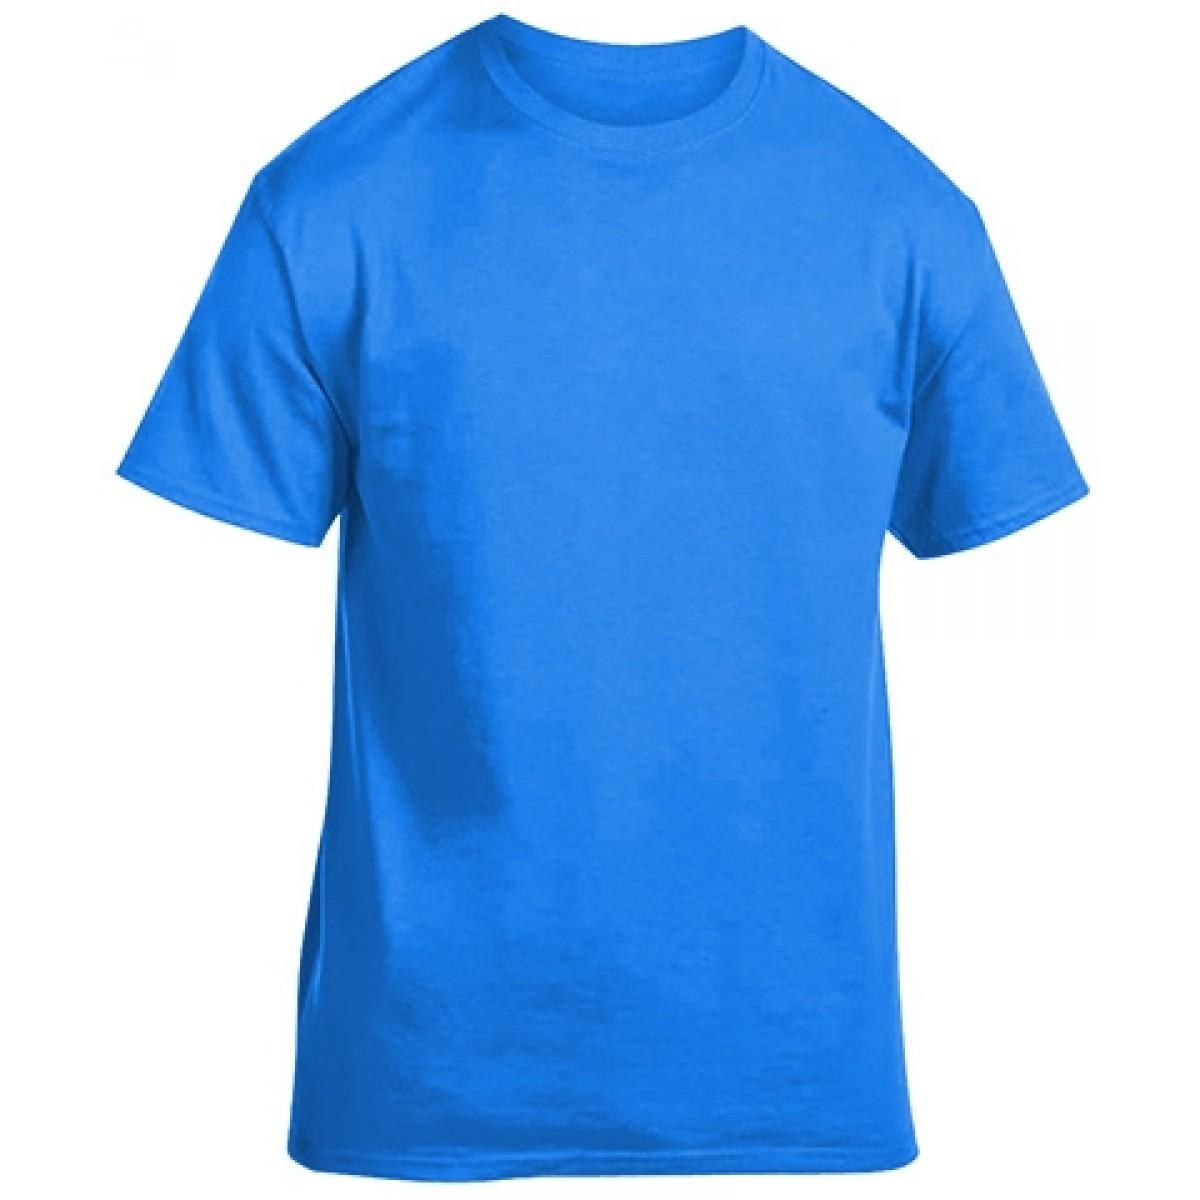 Soft 100% Cotton T-Shirt-Neon Blue-2XL